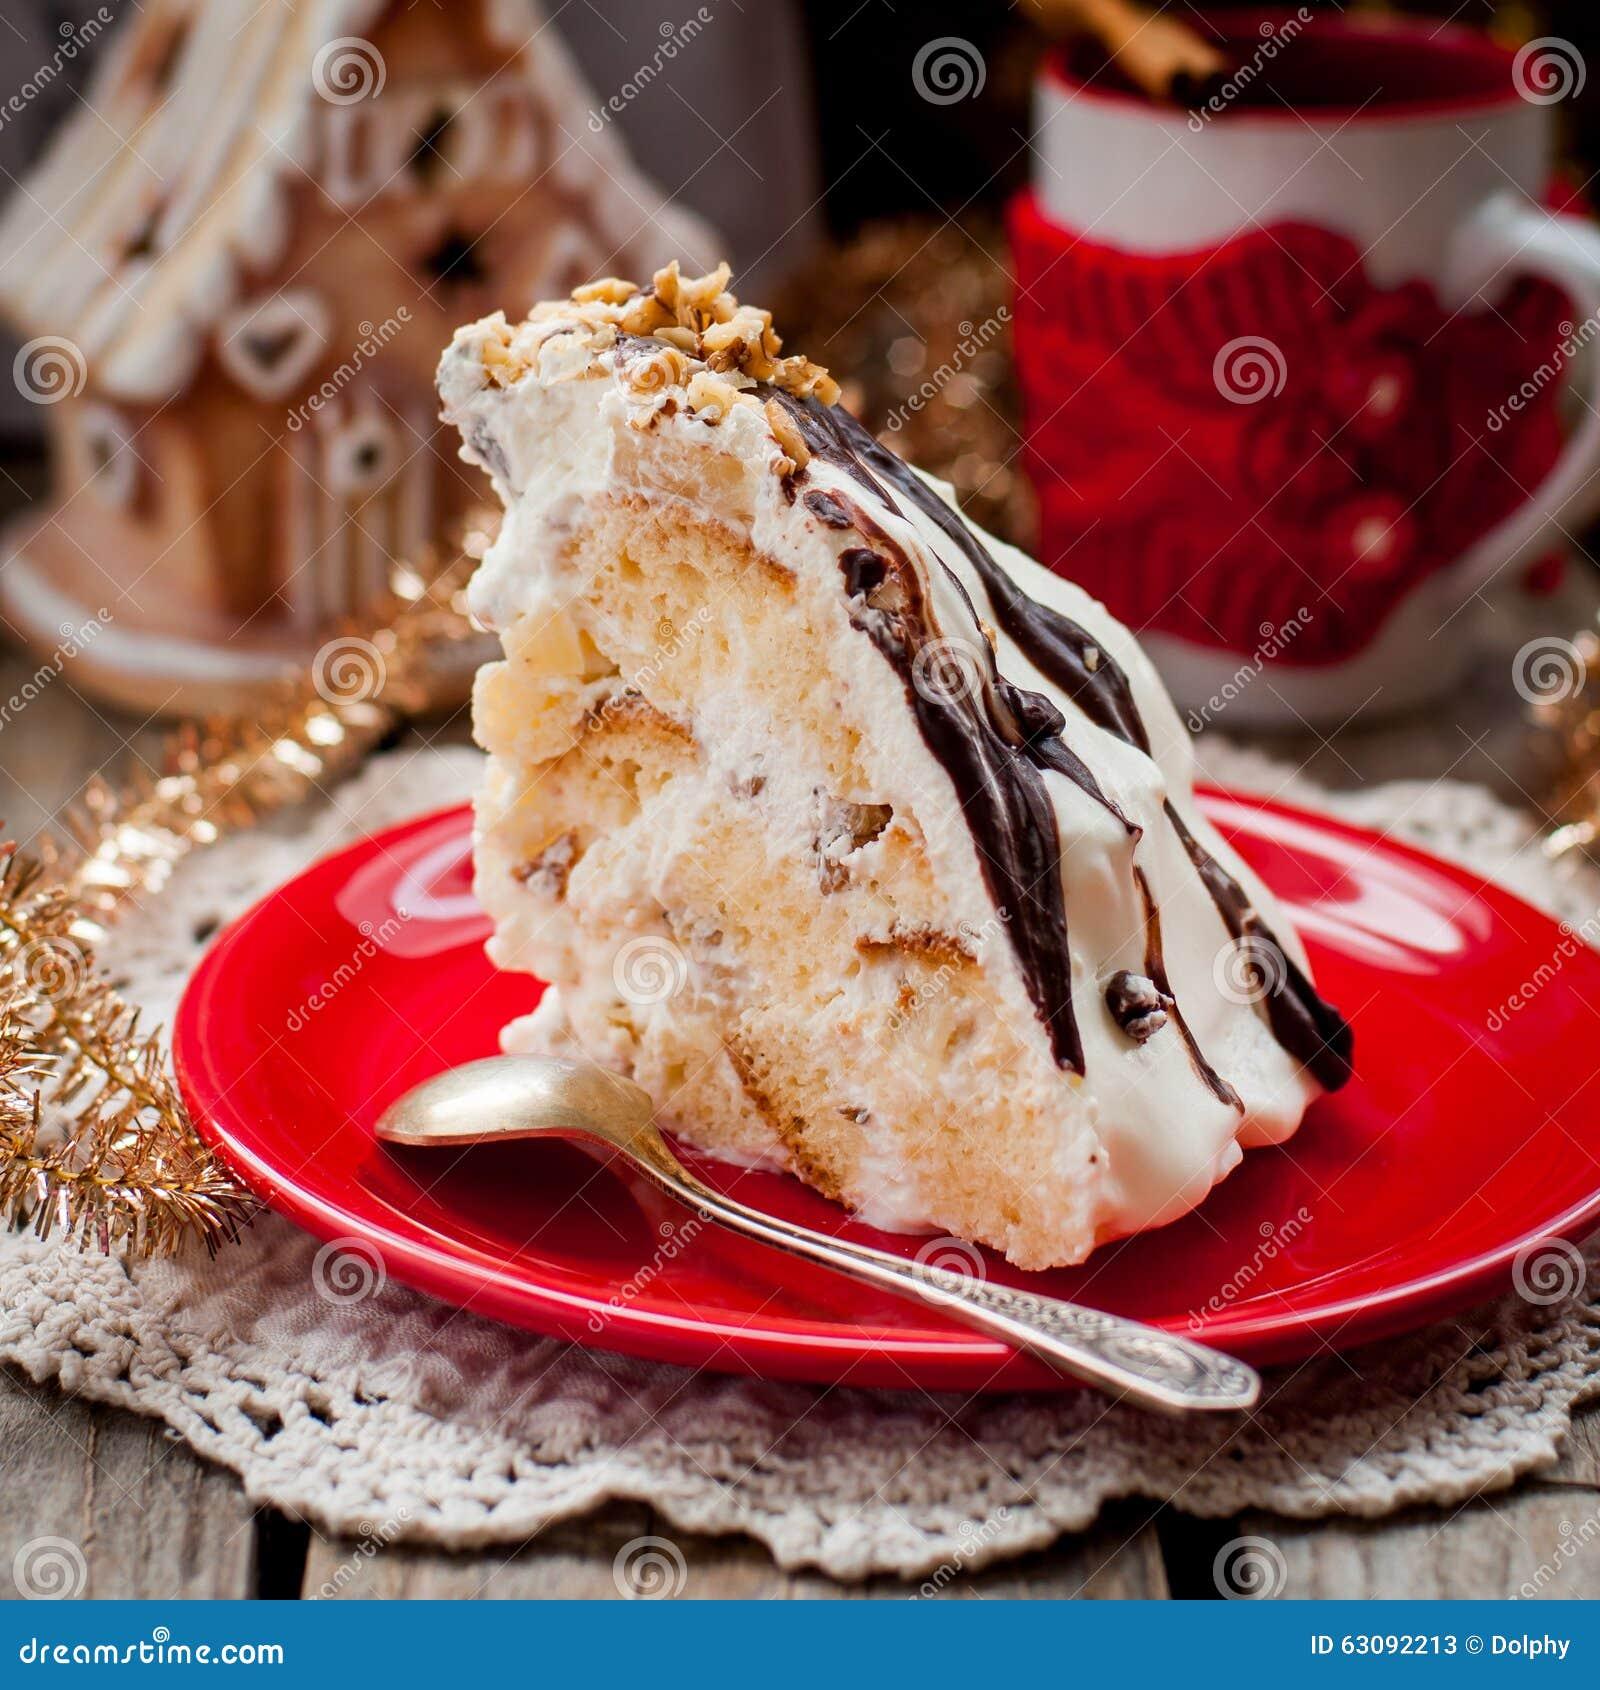 Download Pancho Cake image stock. Image du givrage, laiterie, cuisine - 63092213